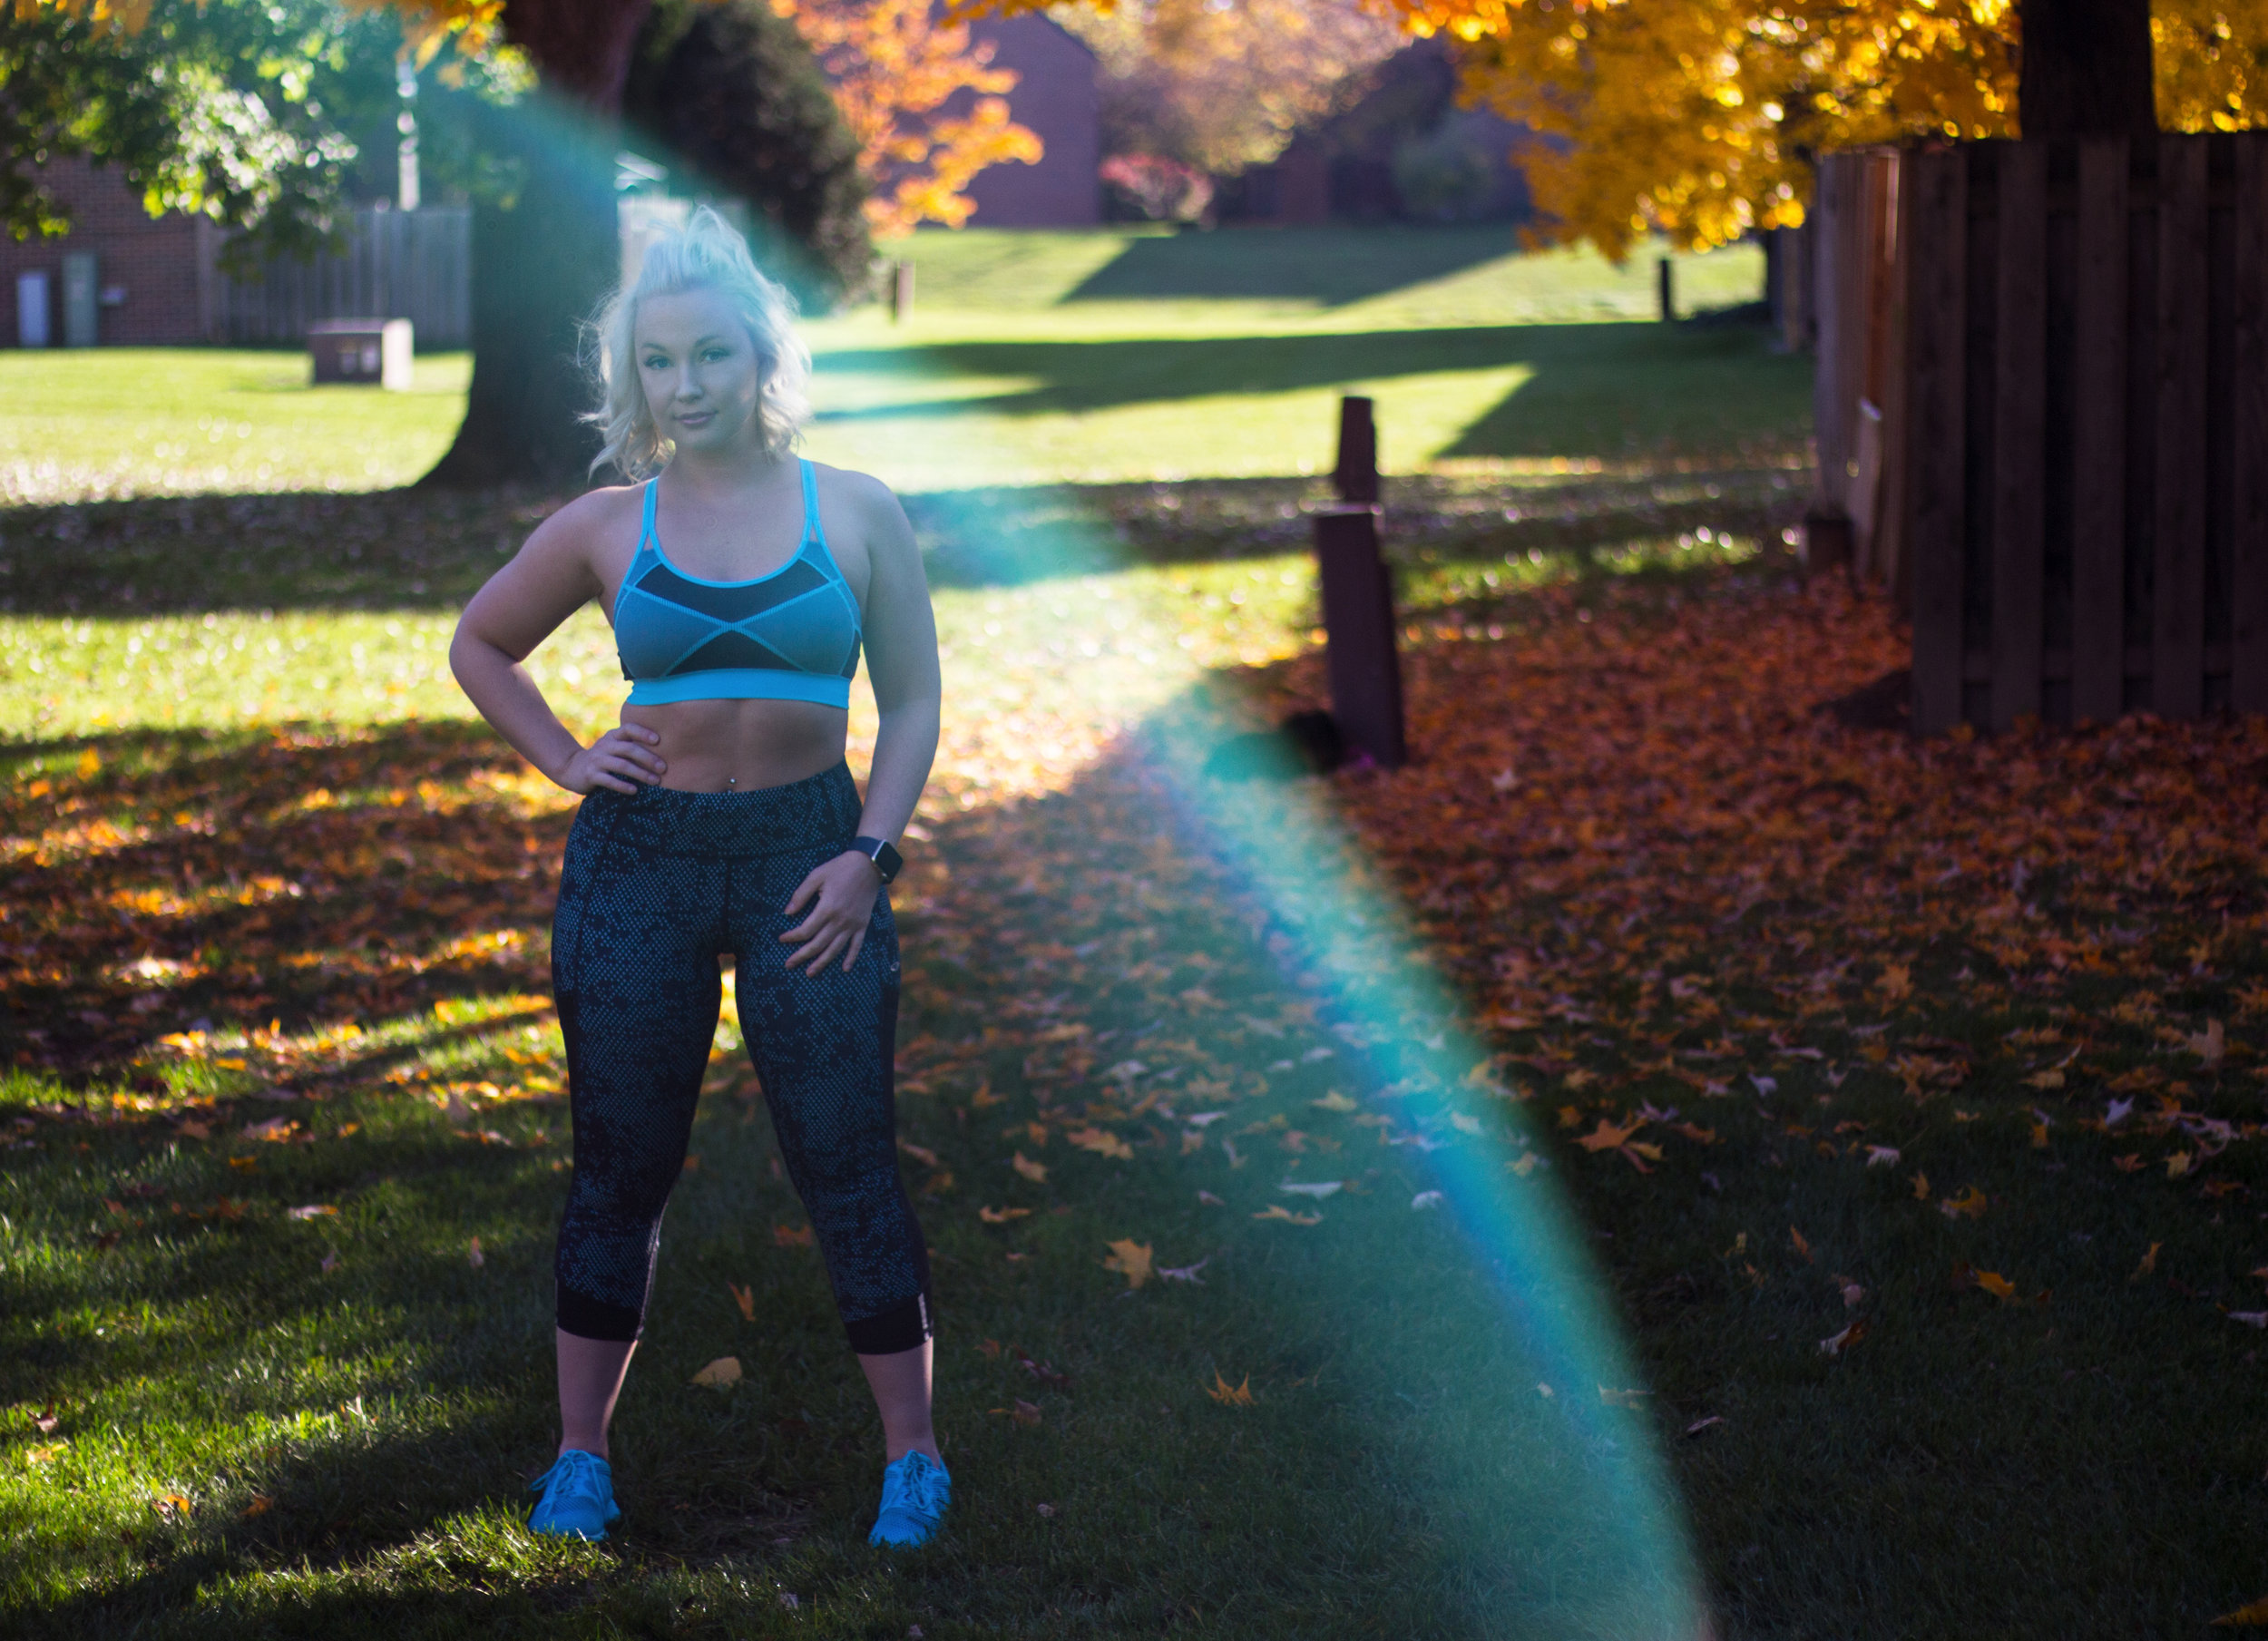 Emily Essentially | Lifestyle | Body Transformation Journey: My Start 7